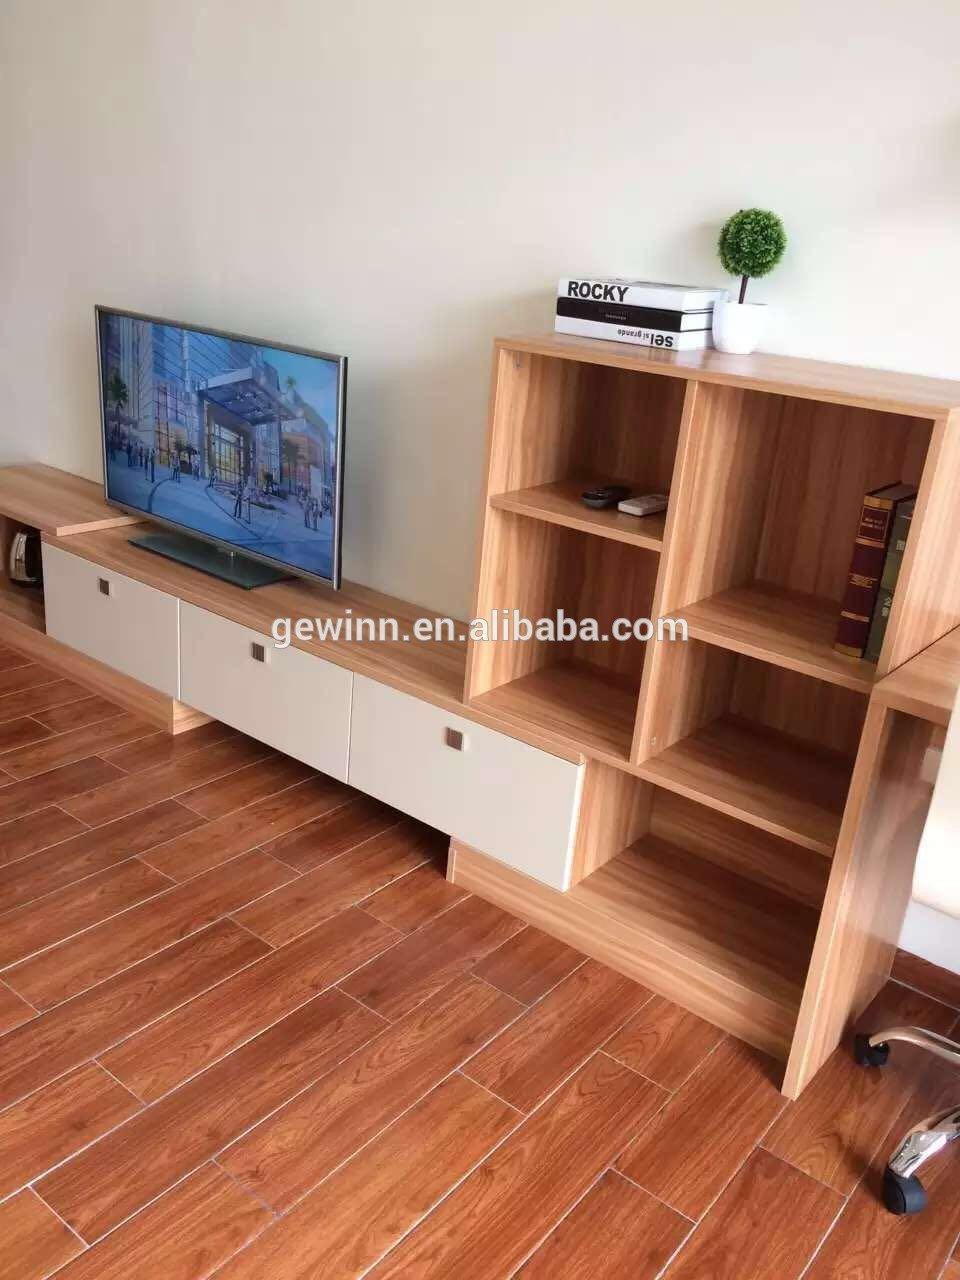 Custom plate setting woodworking equipment Gewinn machinel